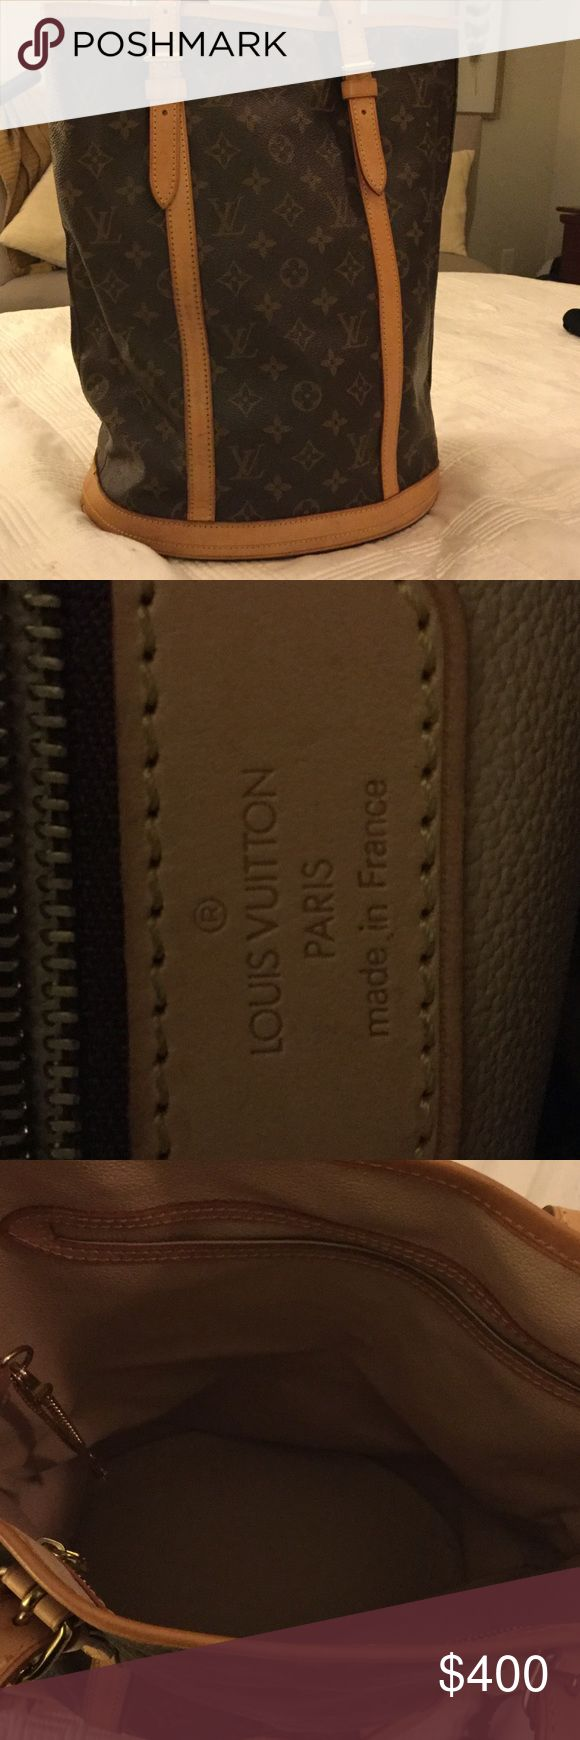 Louis Vuitton Large Bucket Bag Classic Bucket Bag Louis Vuitton Bags Shoulder Bags